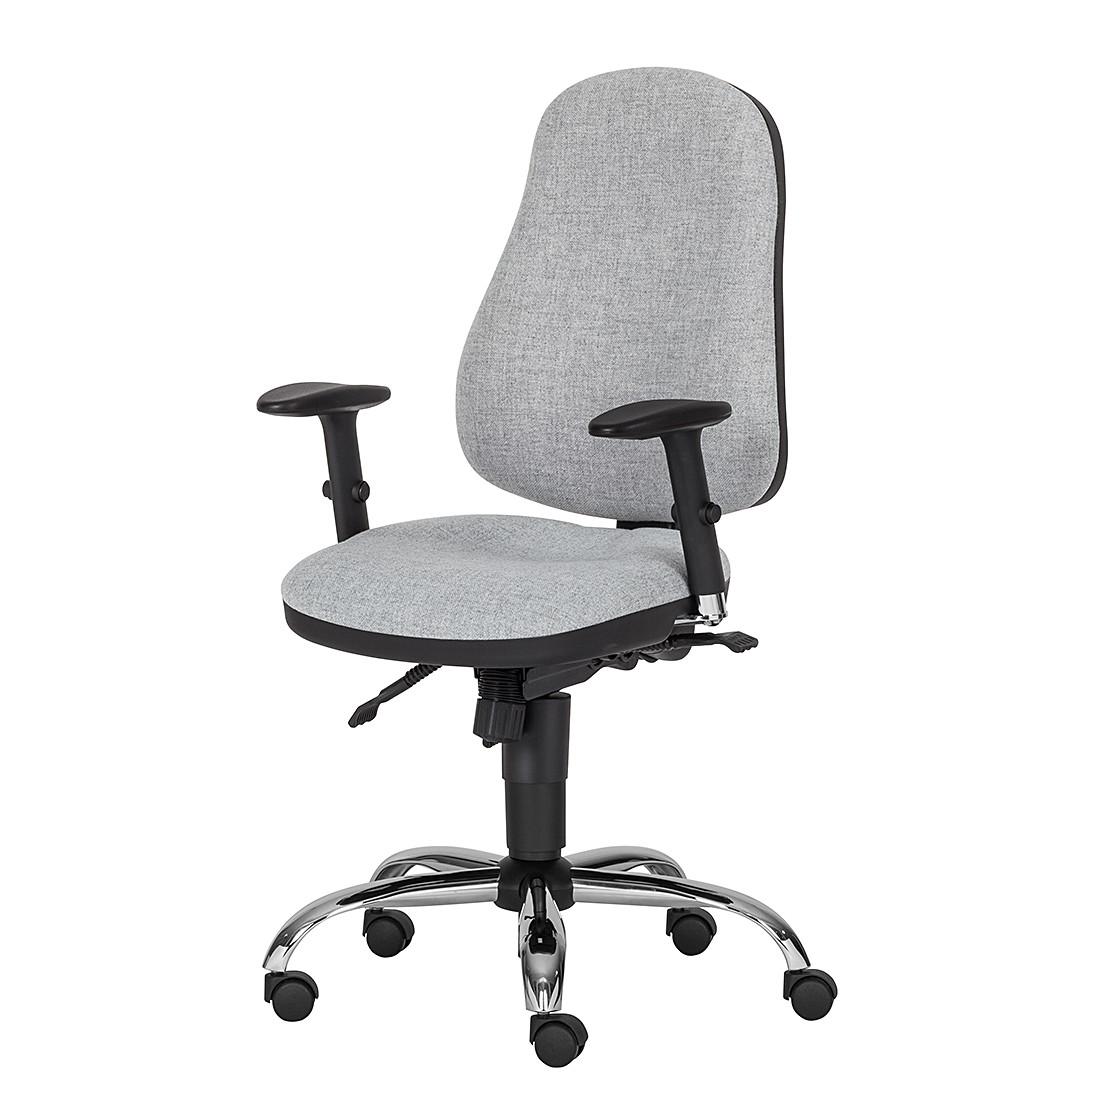 Bürodrehstuhl Offix – Webstoff – Hellgrau, Nowy Styl online kaufen